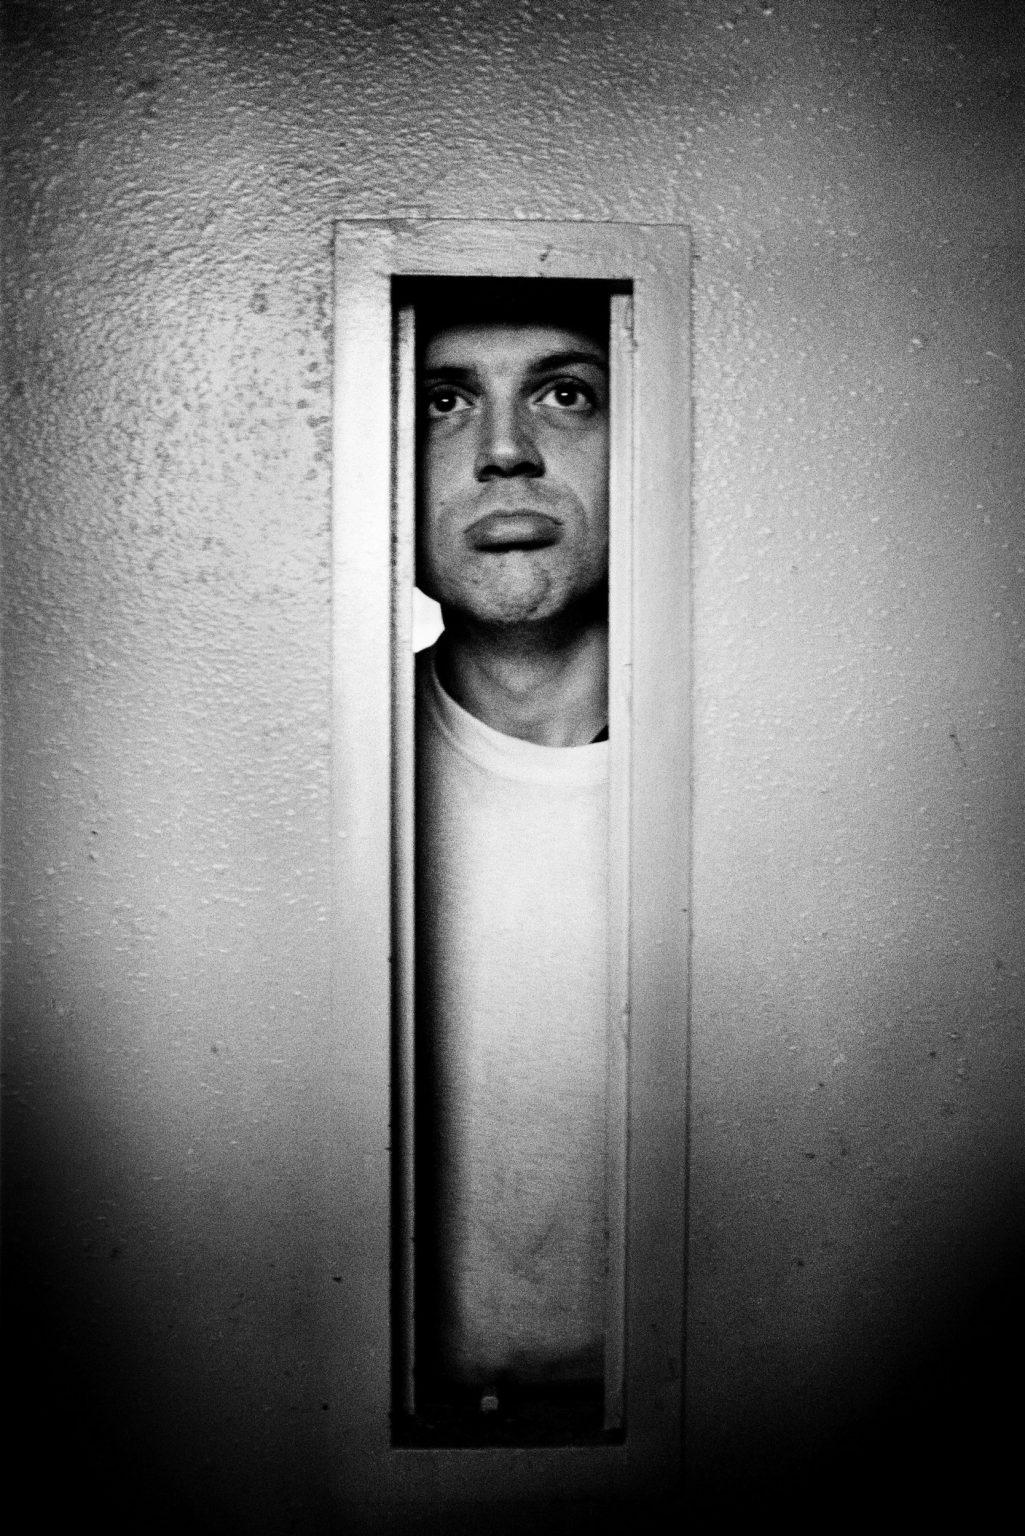 "Aversa ( Caserta ), January 2007 - The Judicial Psychiatric Hospital ""Filippo Saporito"" - An inmate in his cell"